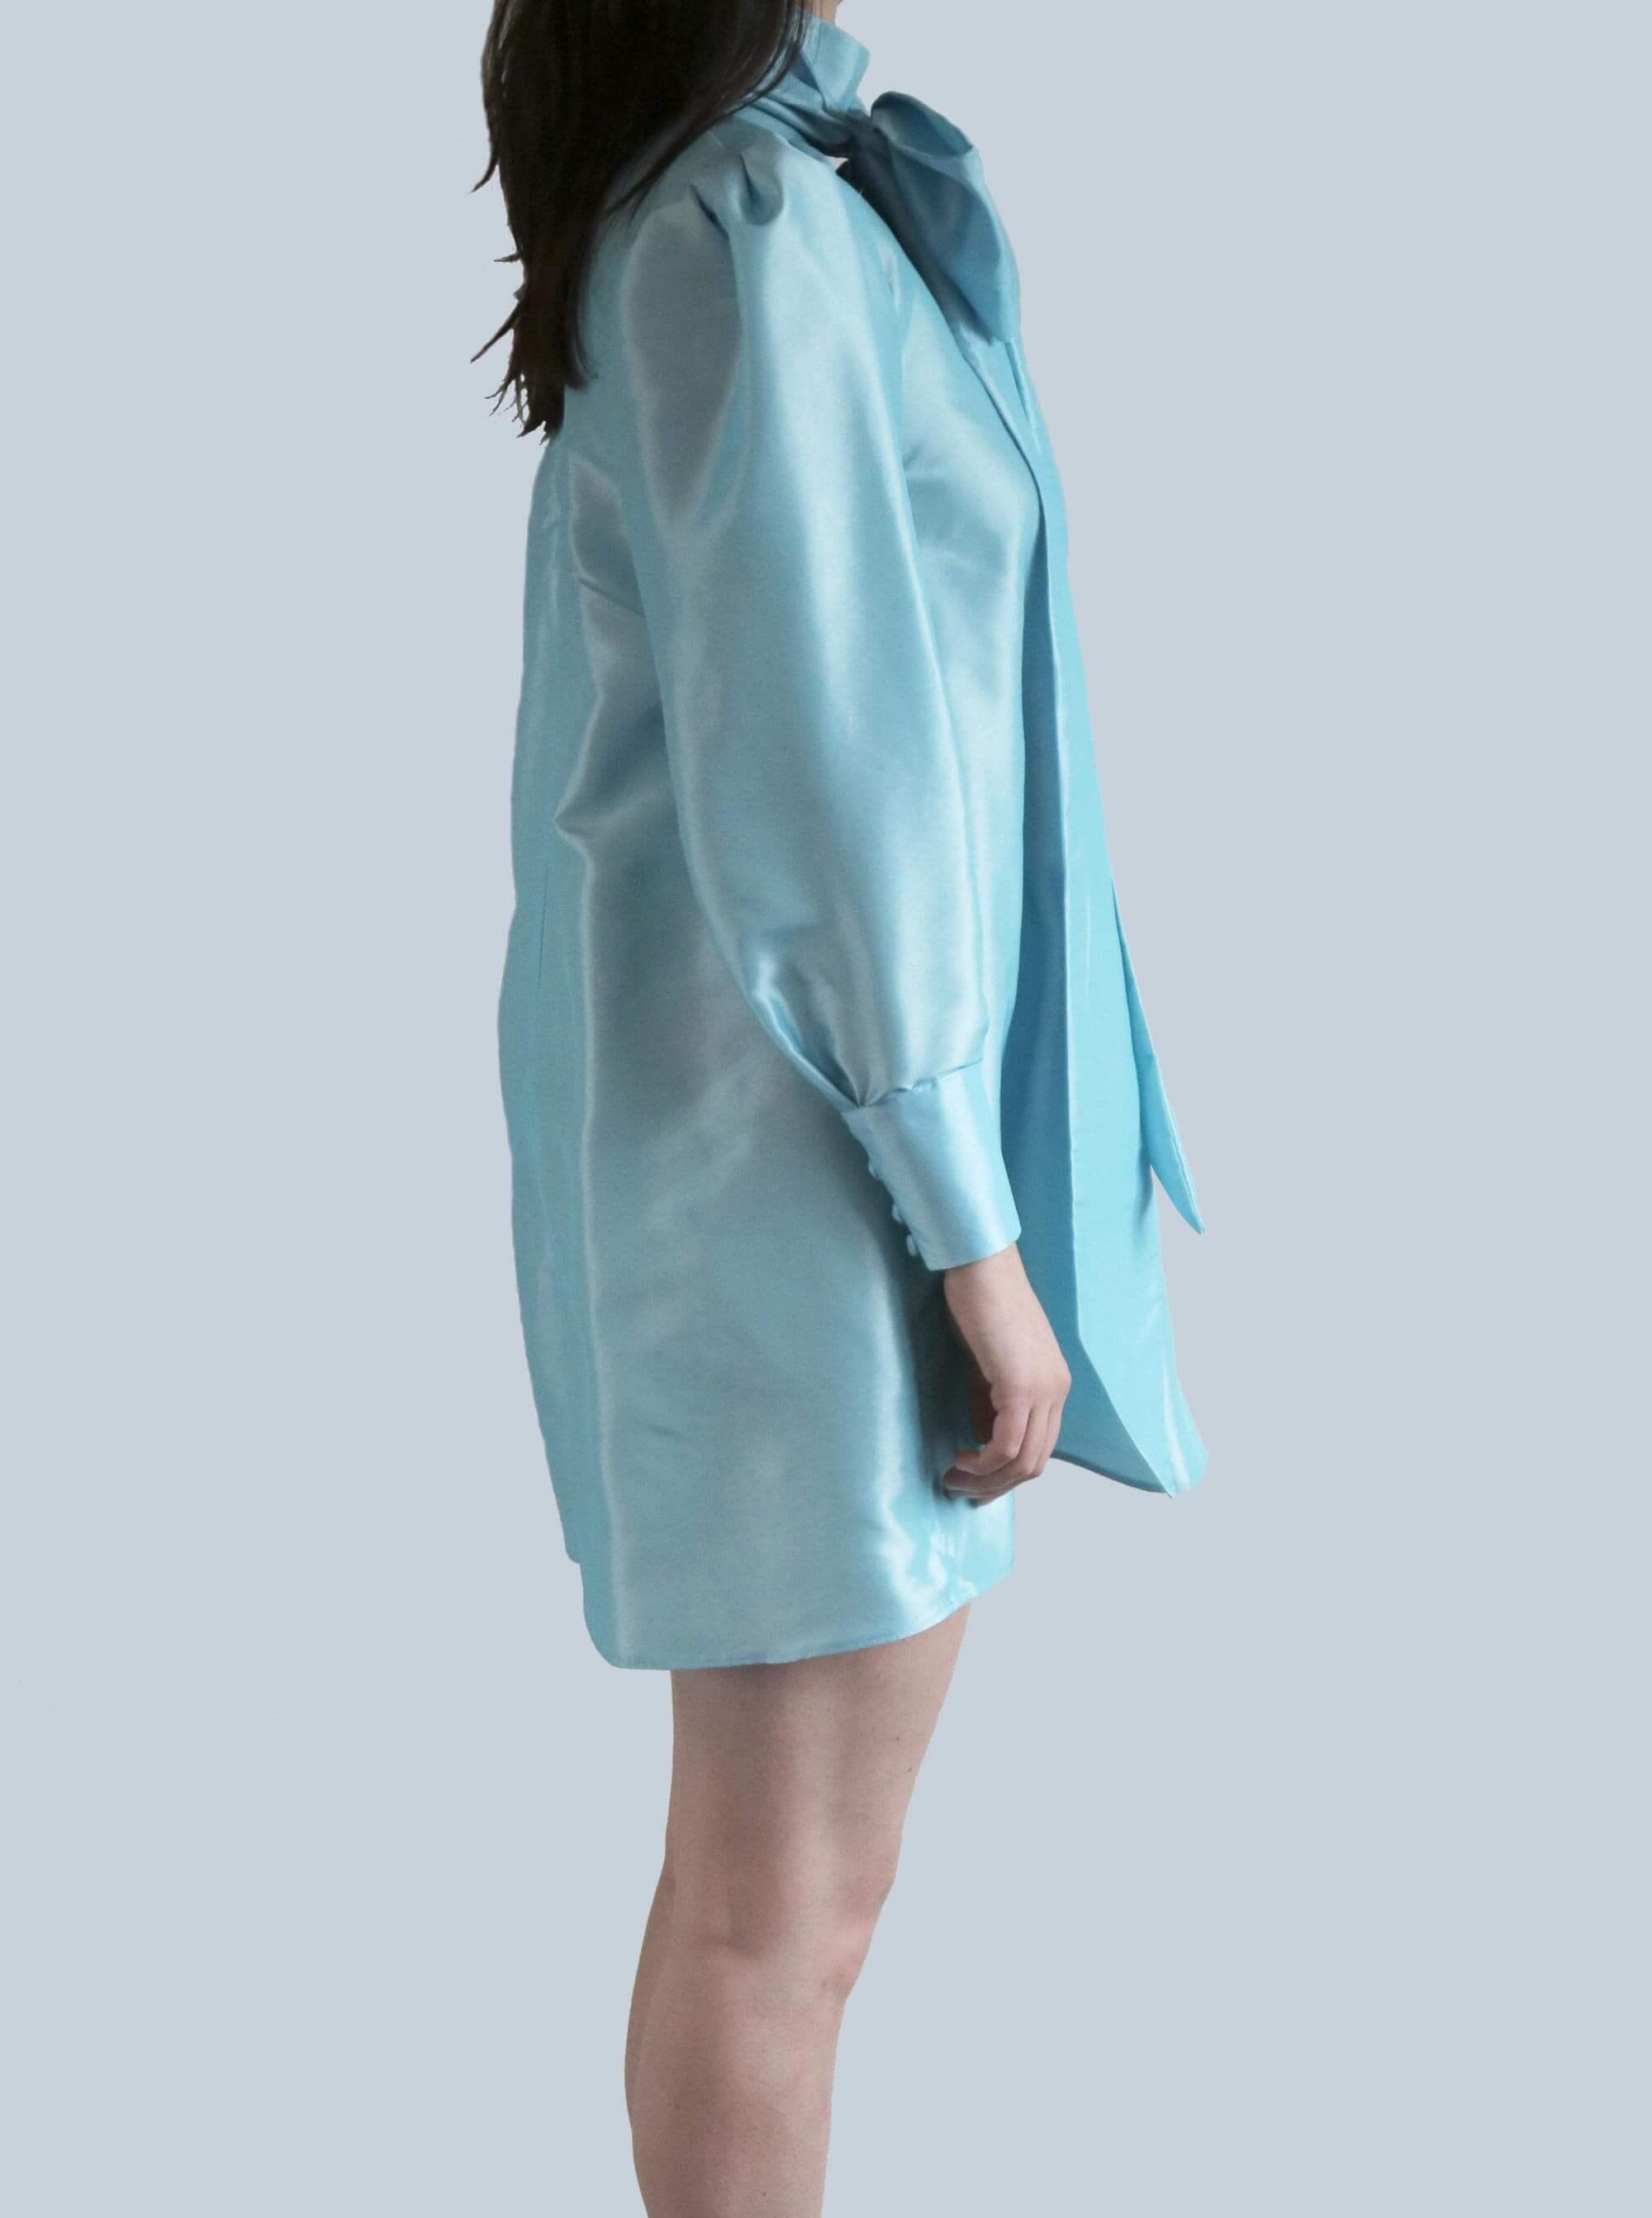 Rosa Lee dress in blue